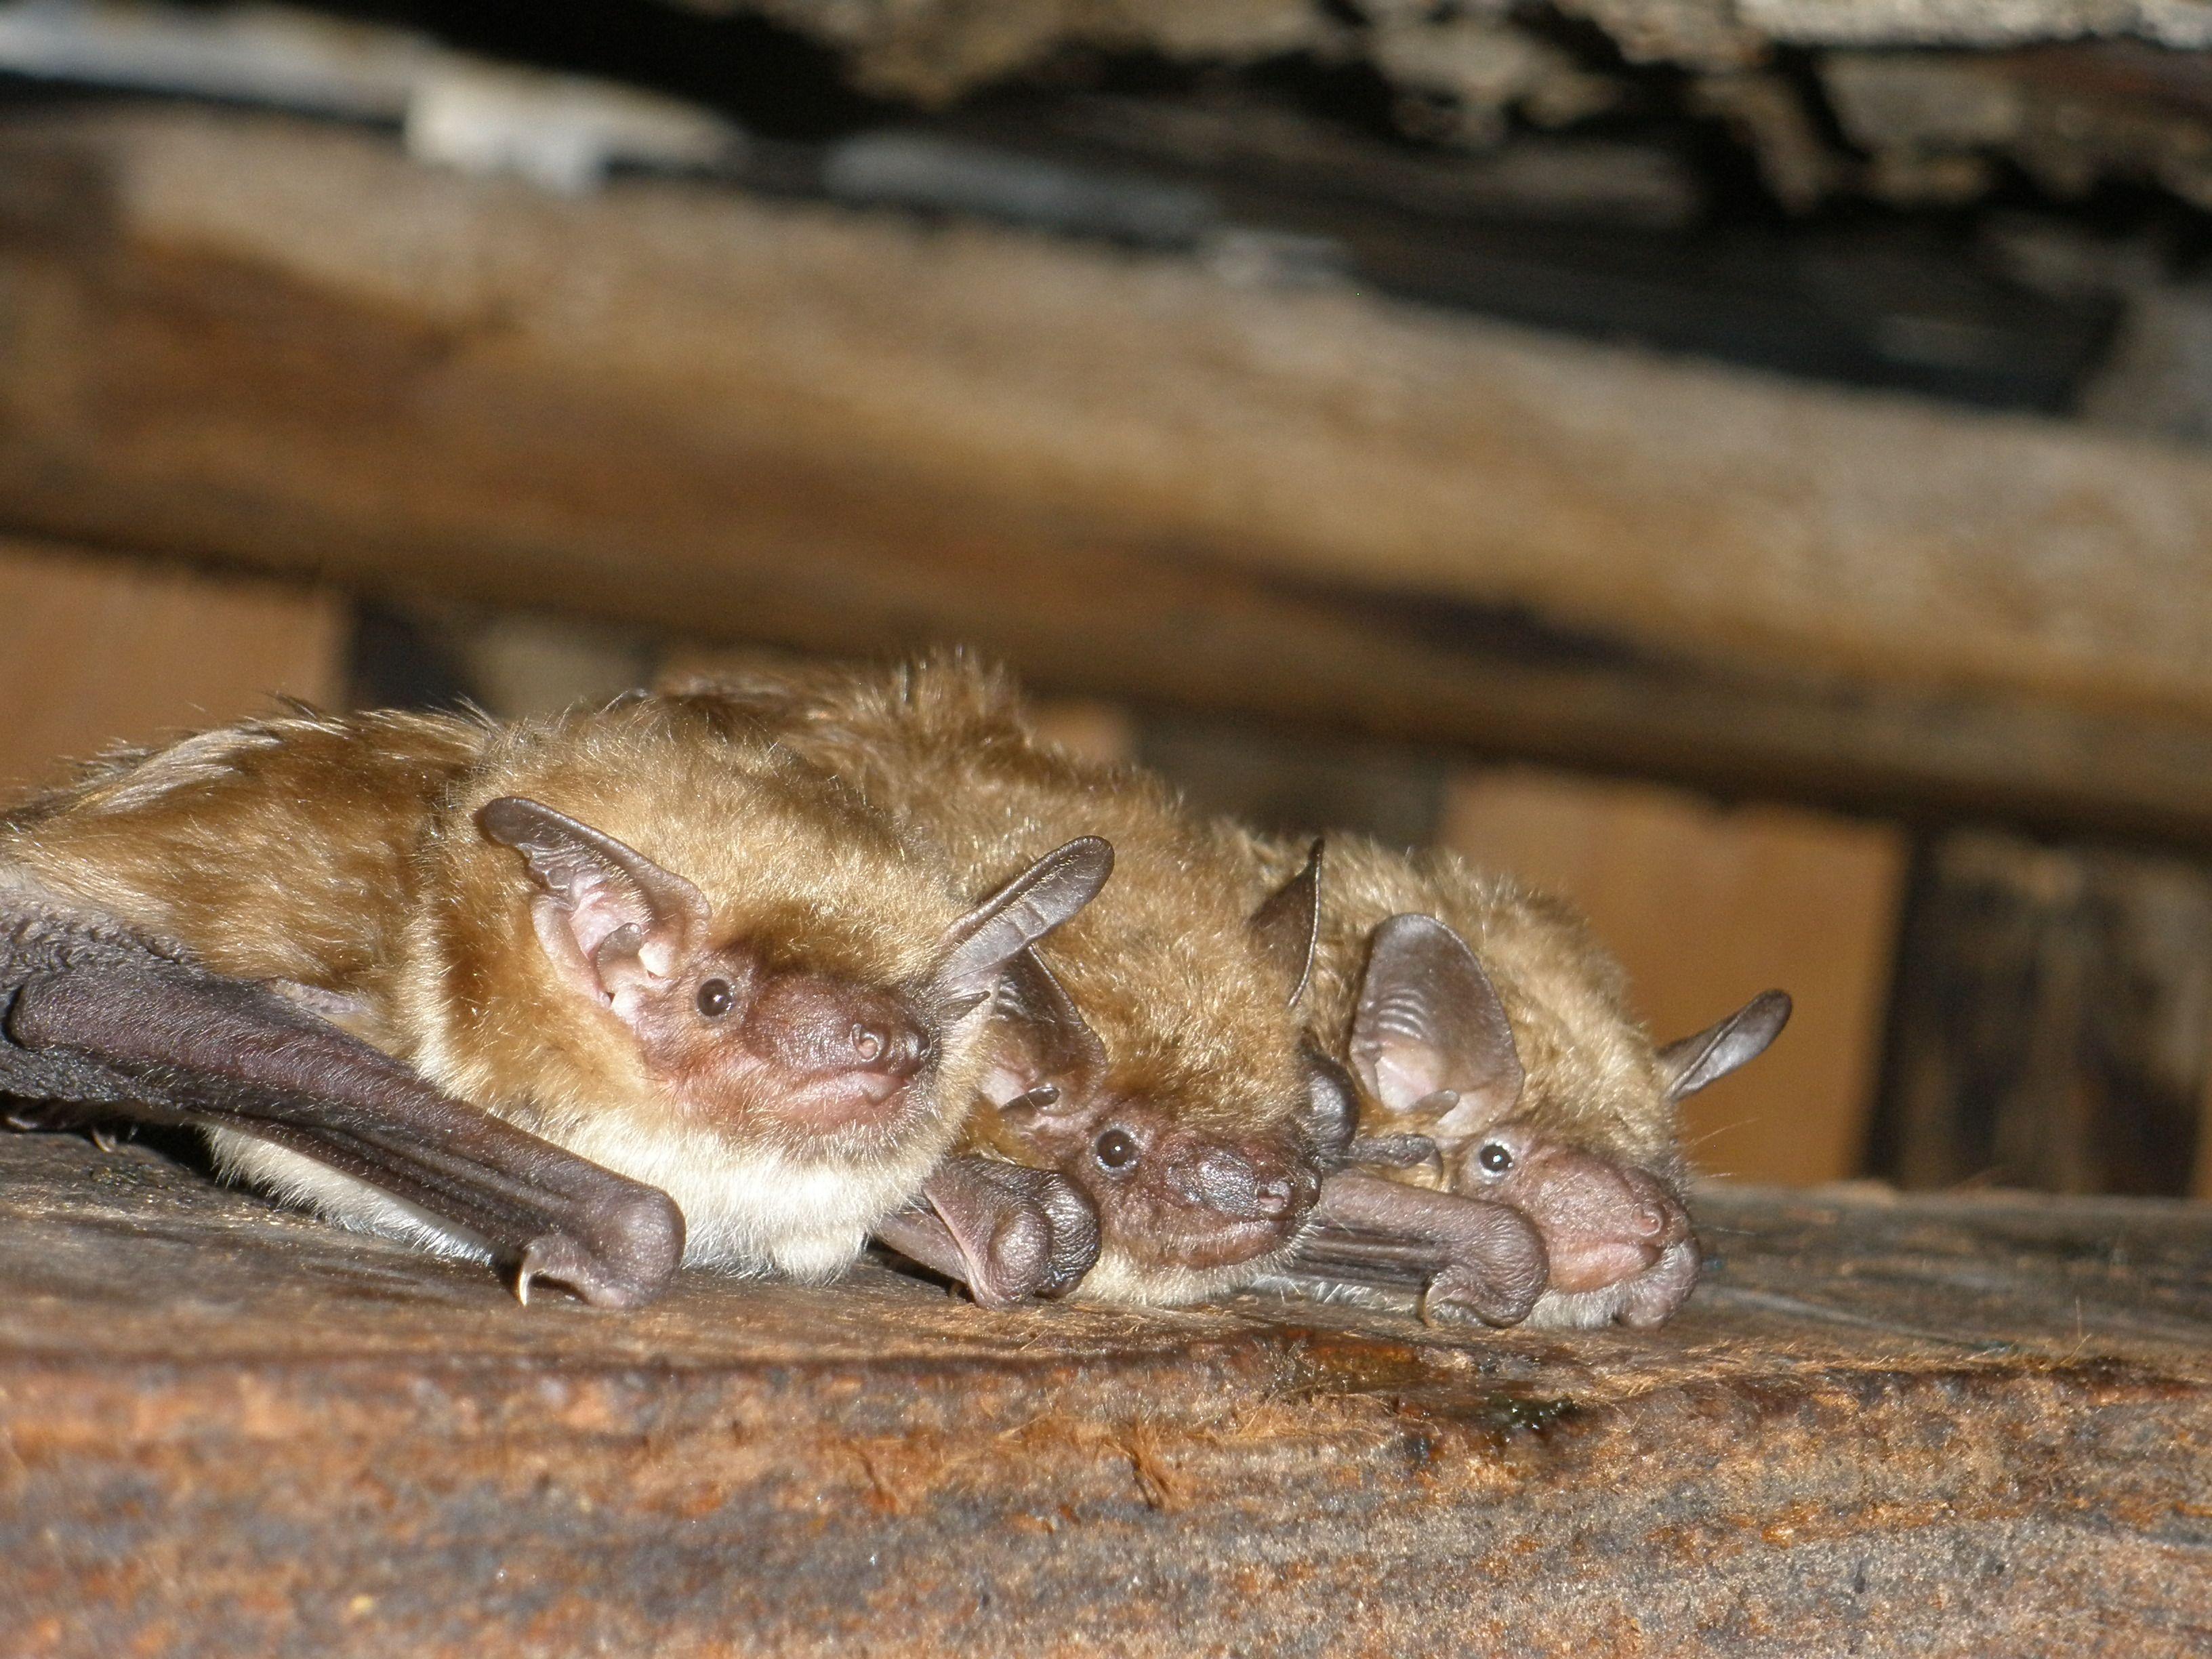 Http Www Gardenstatewildlifecontrol Com Images Sussex County Bats In Attic Jpg Bats In Attic Bat Service Animal